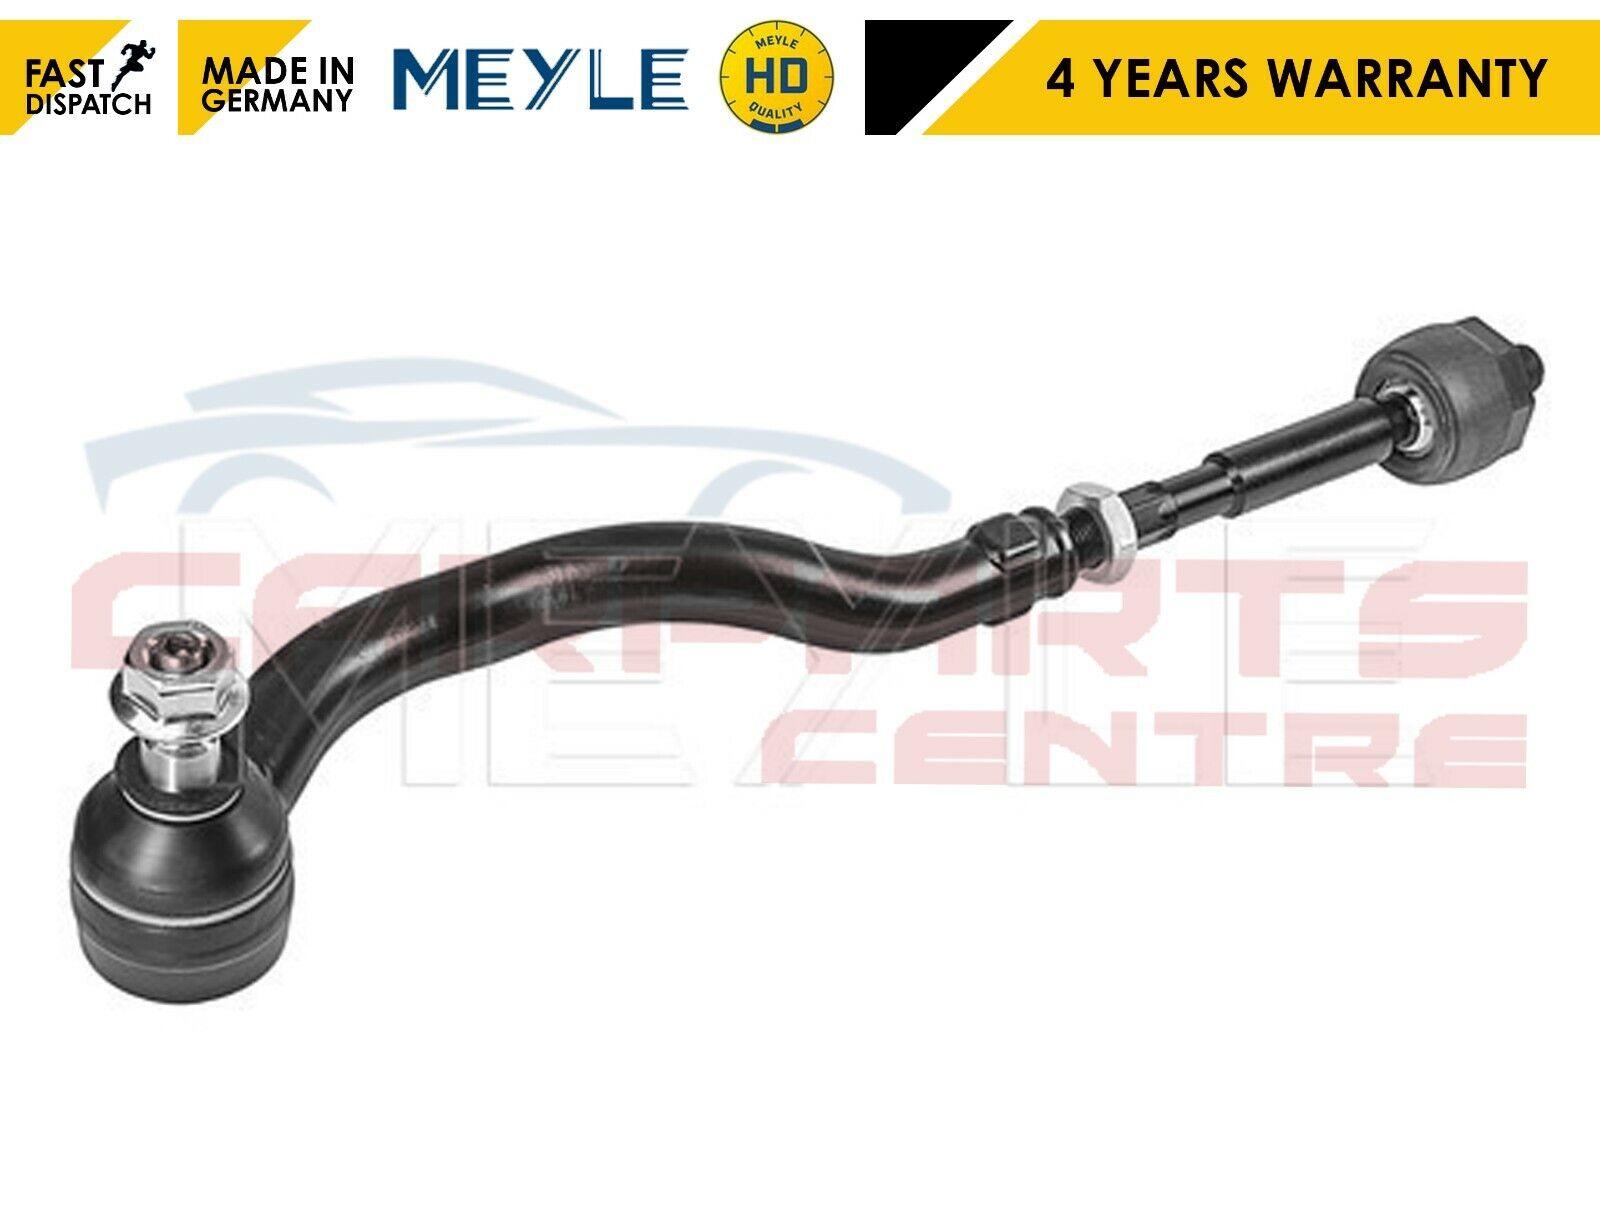 VW Sharan SEAT Alhambra *4 Year Warranty MEYLE HD Track Tie Rod End Right Hand